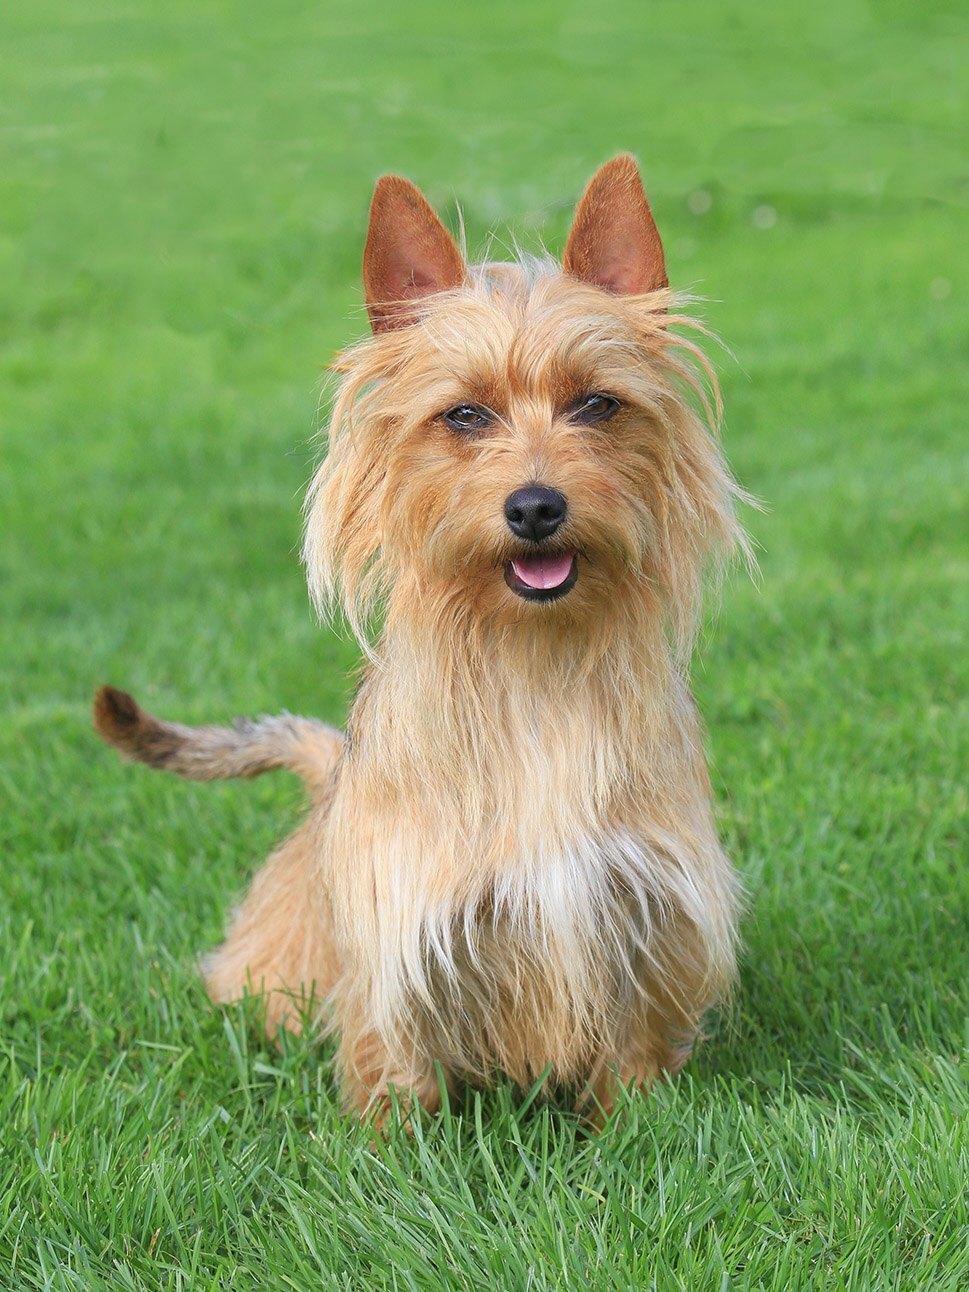 Australian Terrier in the grass